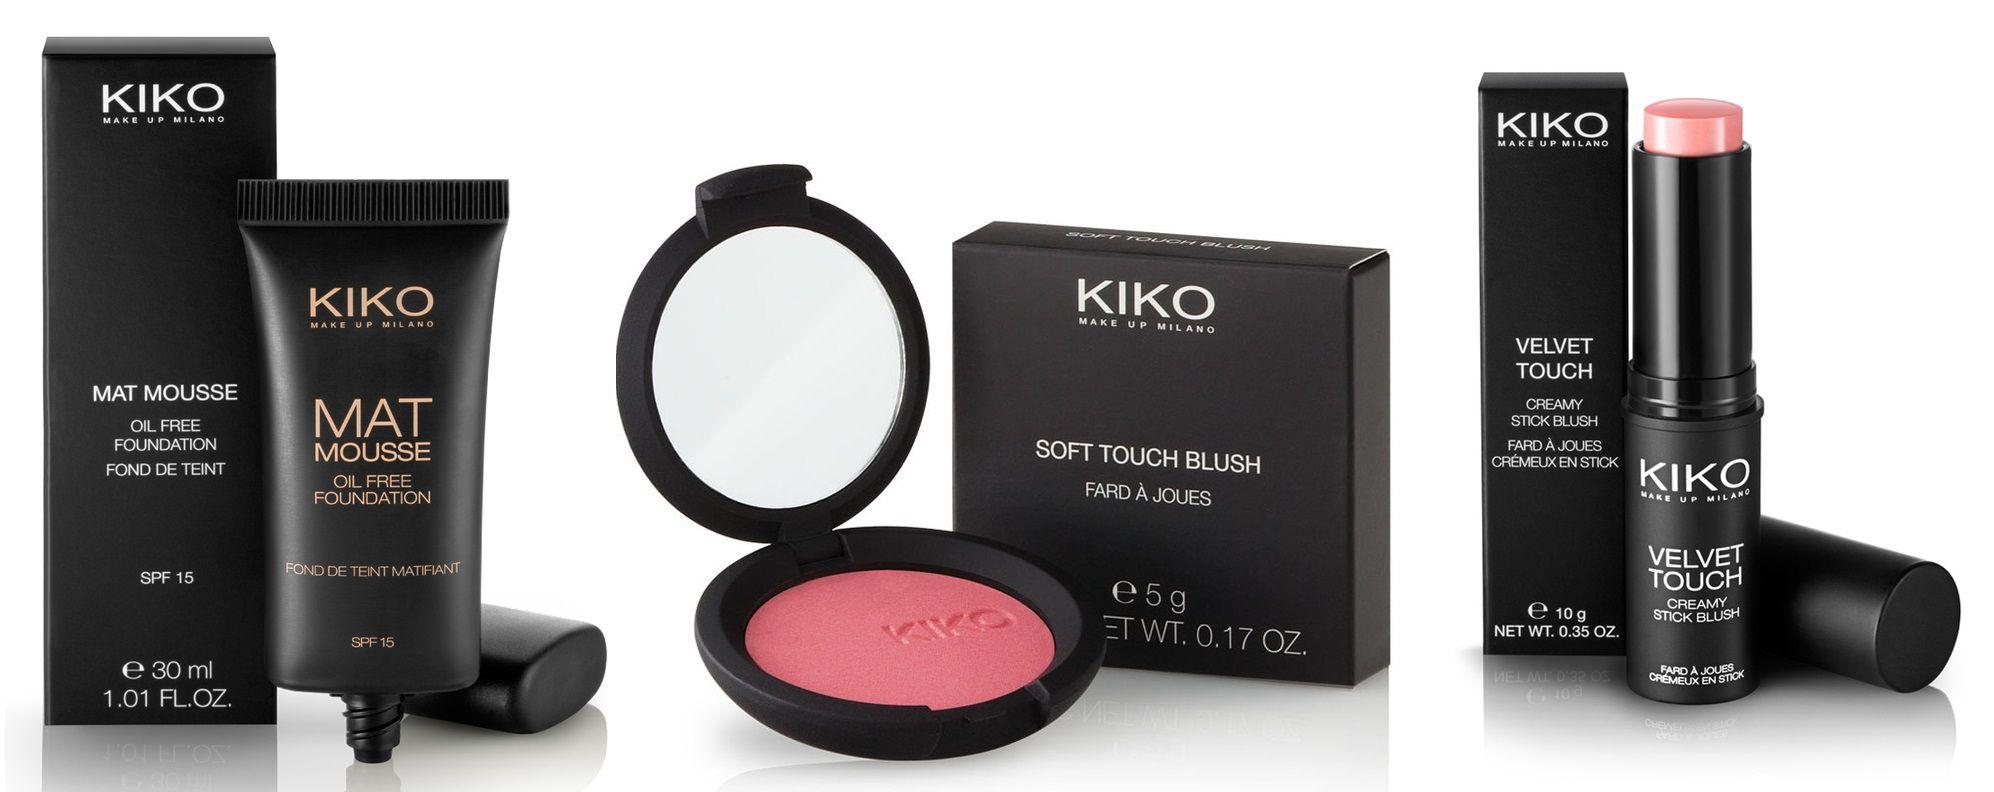 Maquillaje low cost 2016 Kiko